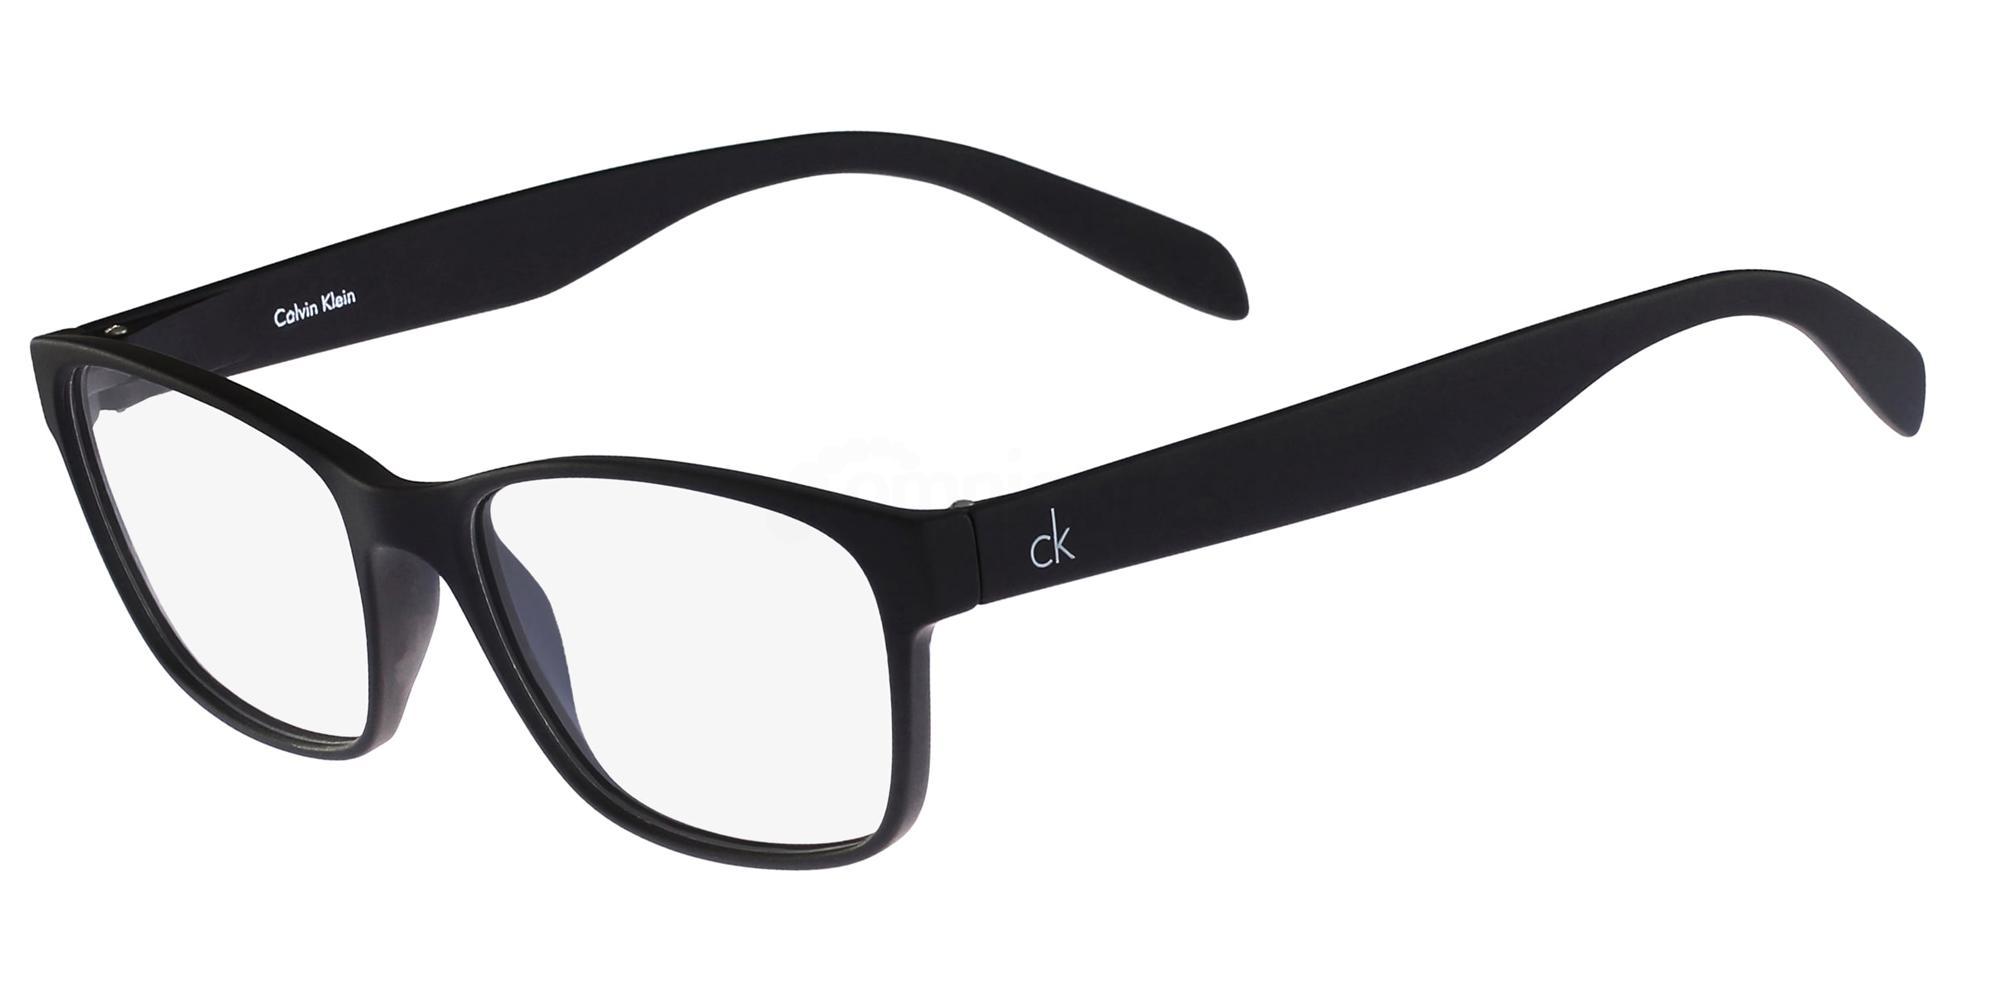 001 CK5890 Glasses, Calvin Klein